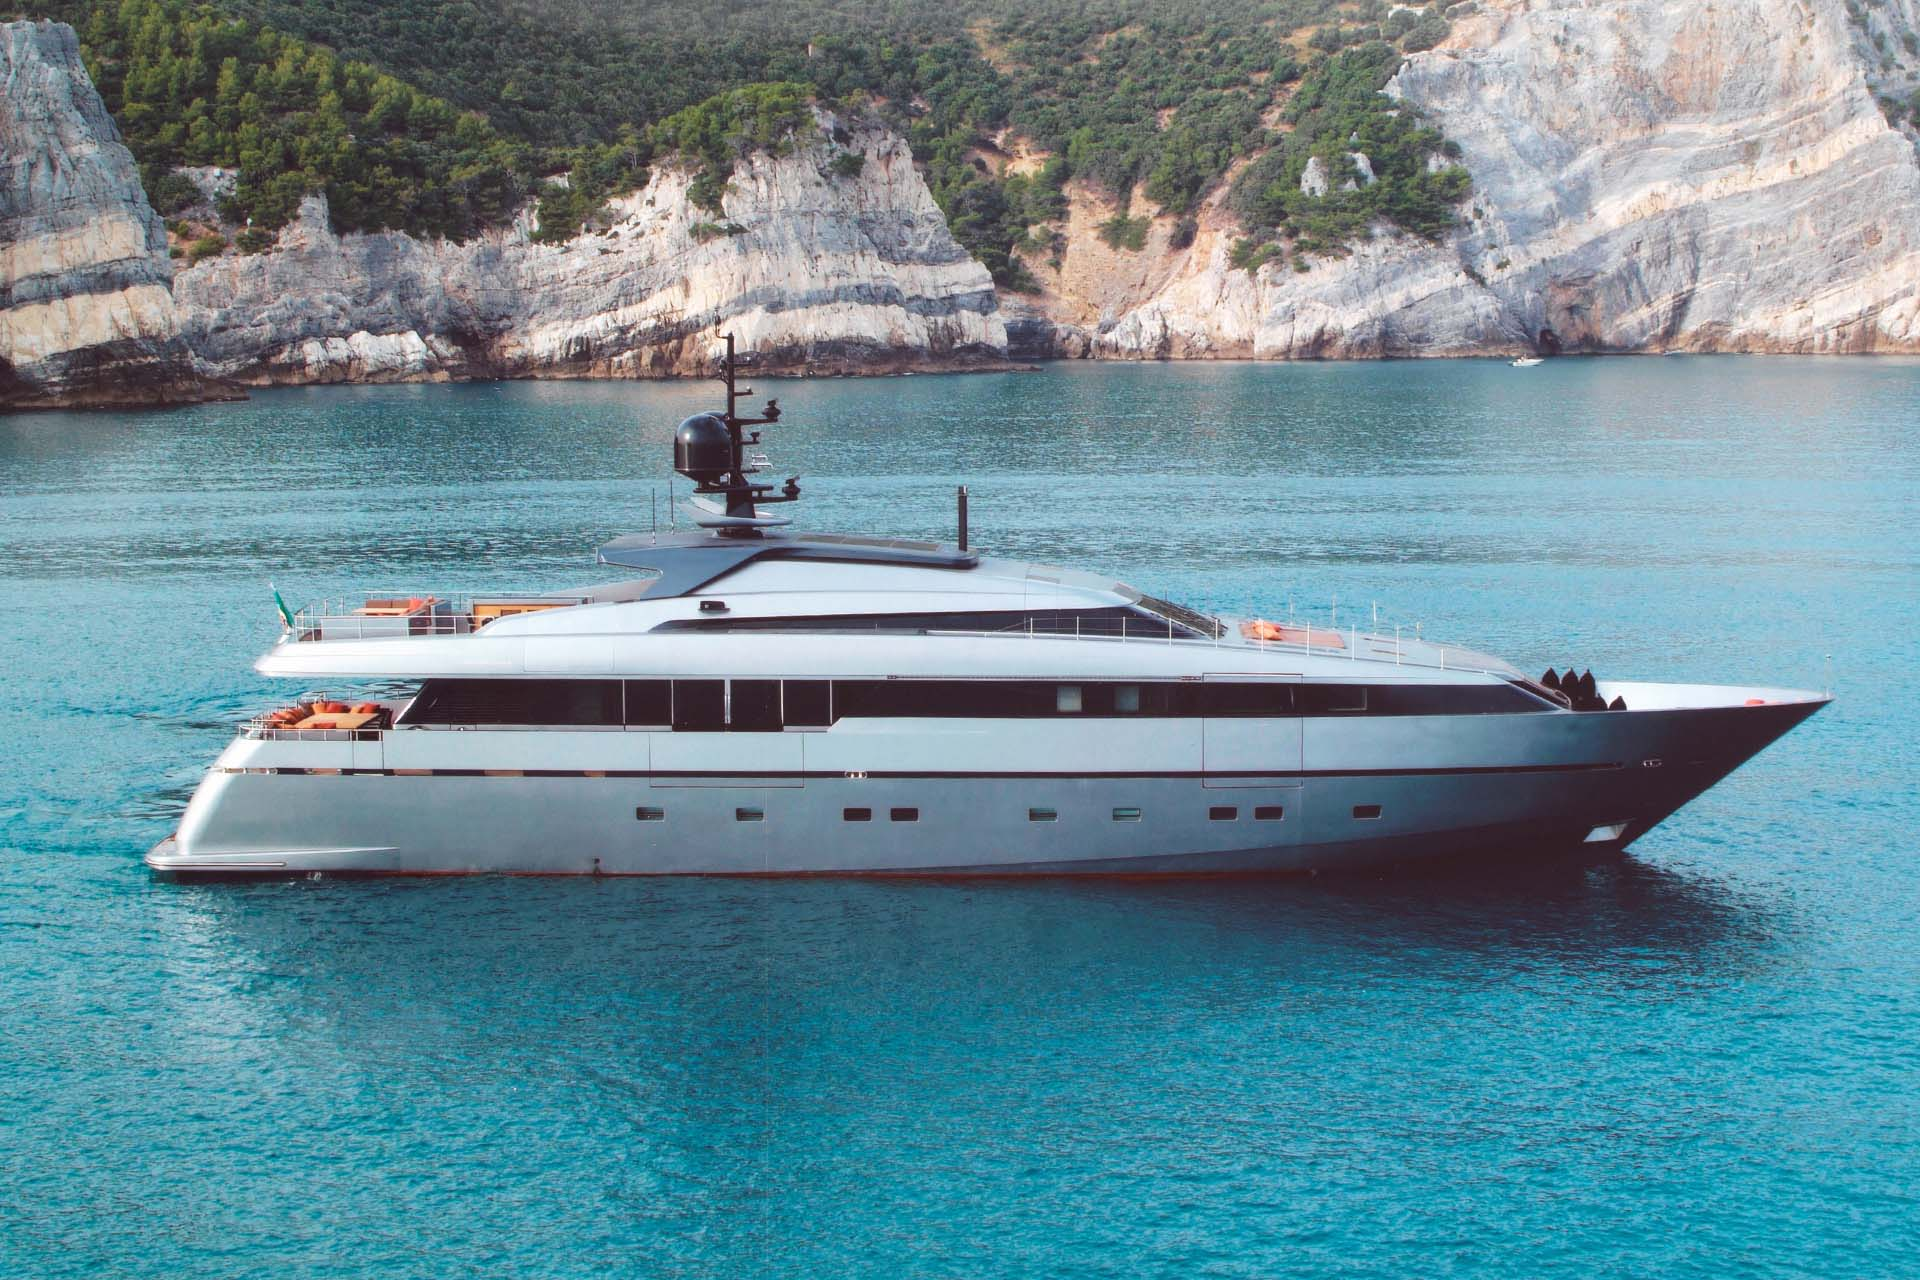 sanlorenzo - 4H - Paskowsky Yacht Design